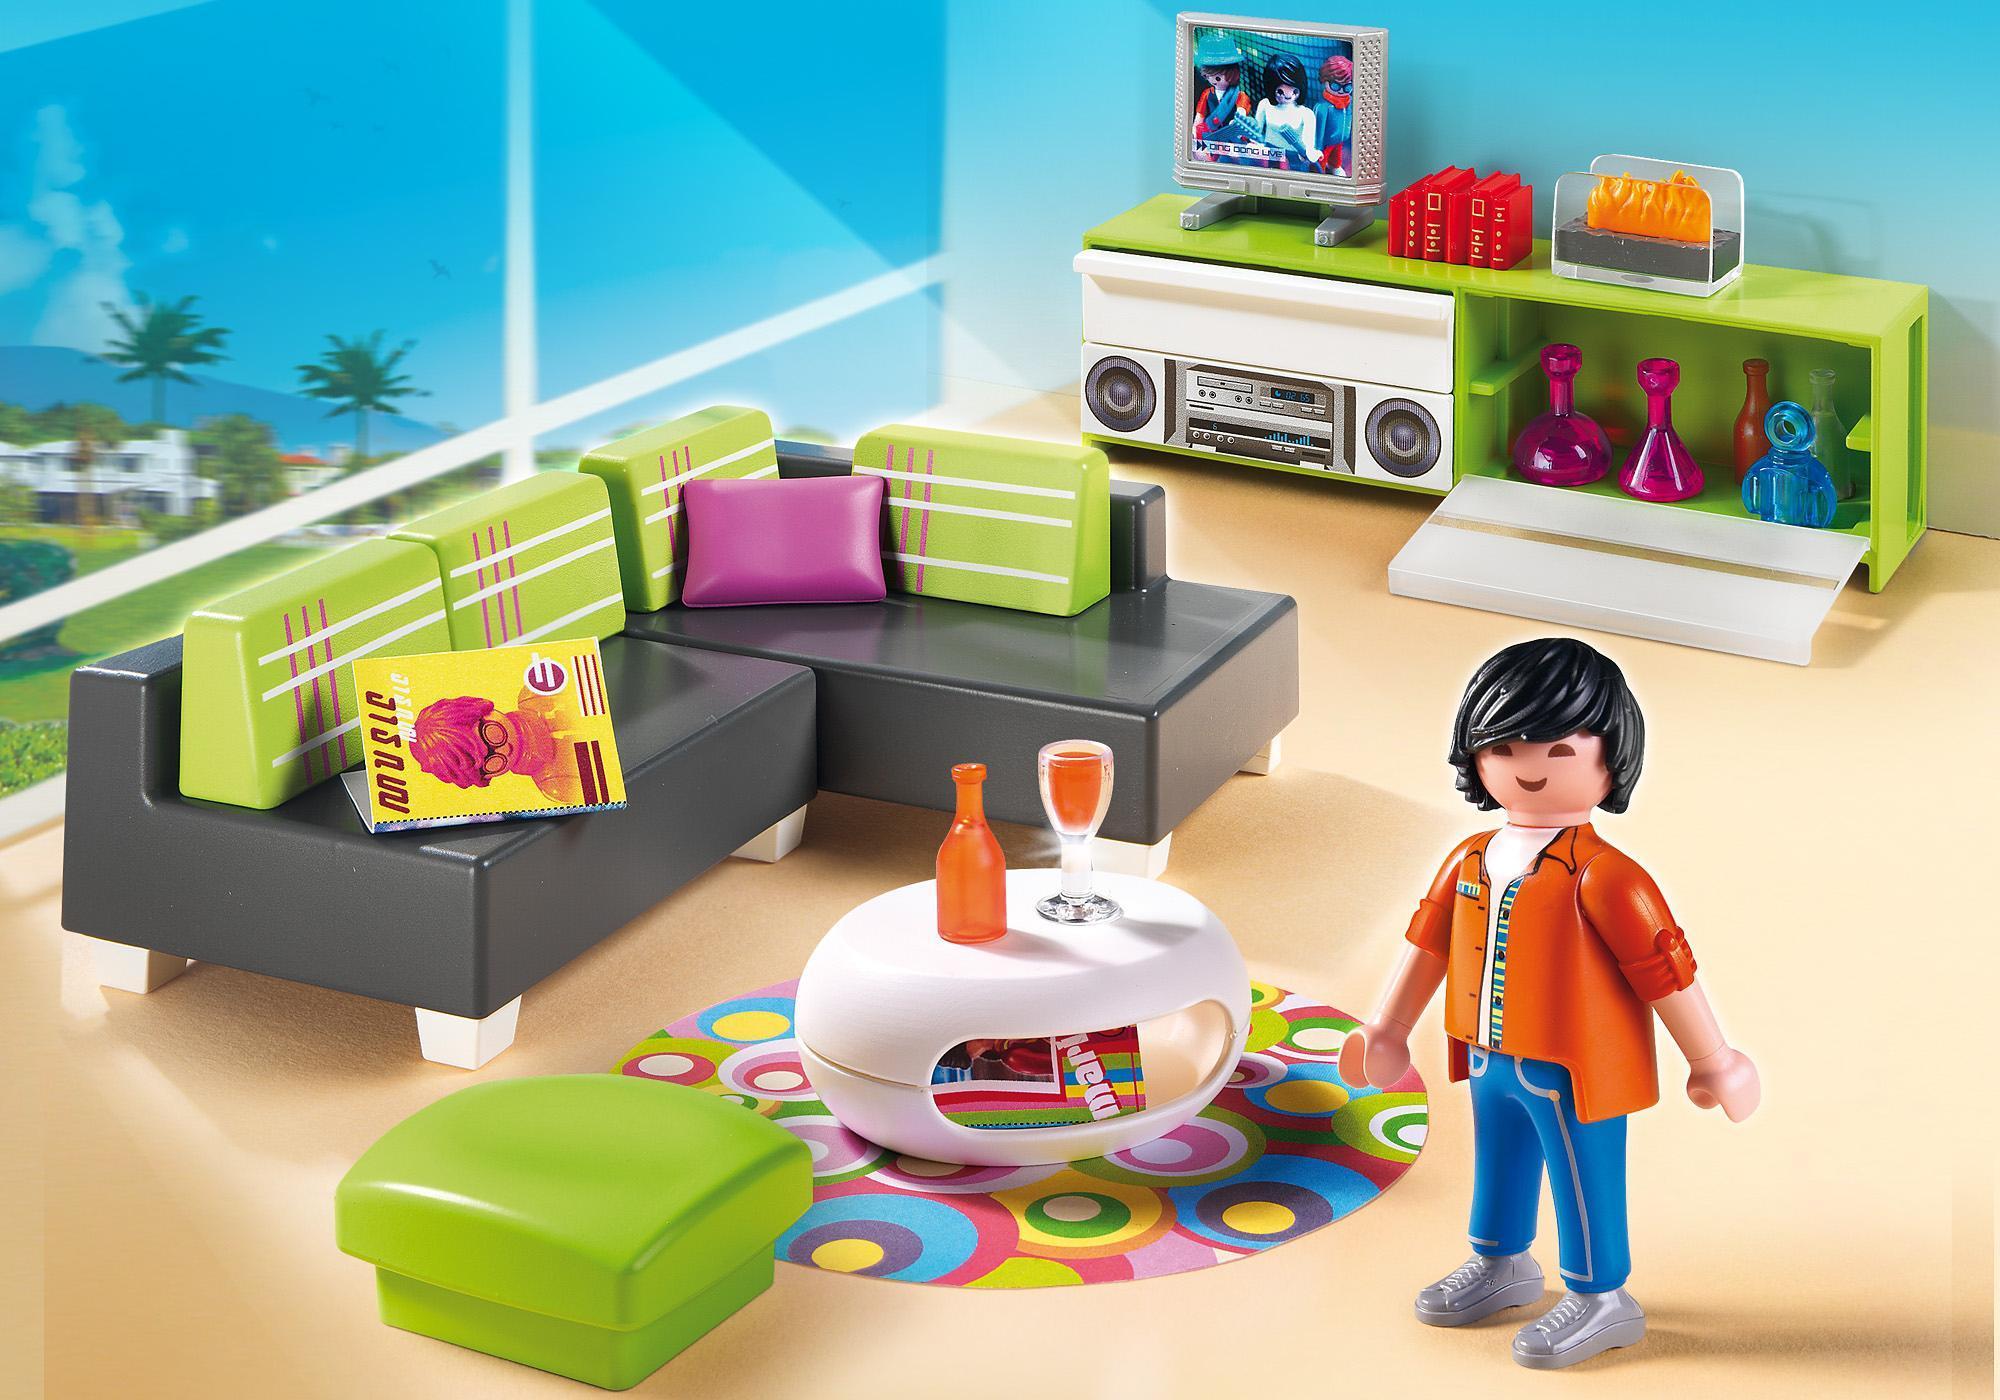 http://media.playmobil.com/i/playmobil/5584_product_detail/Wohnzimmer